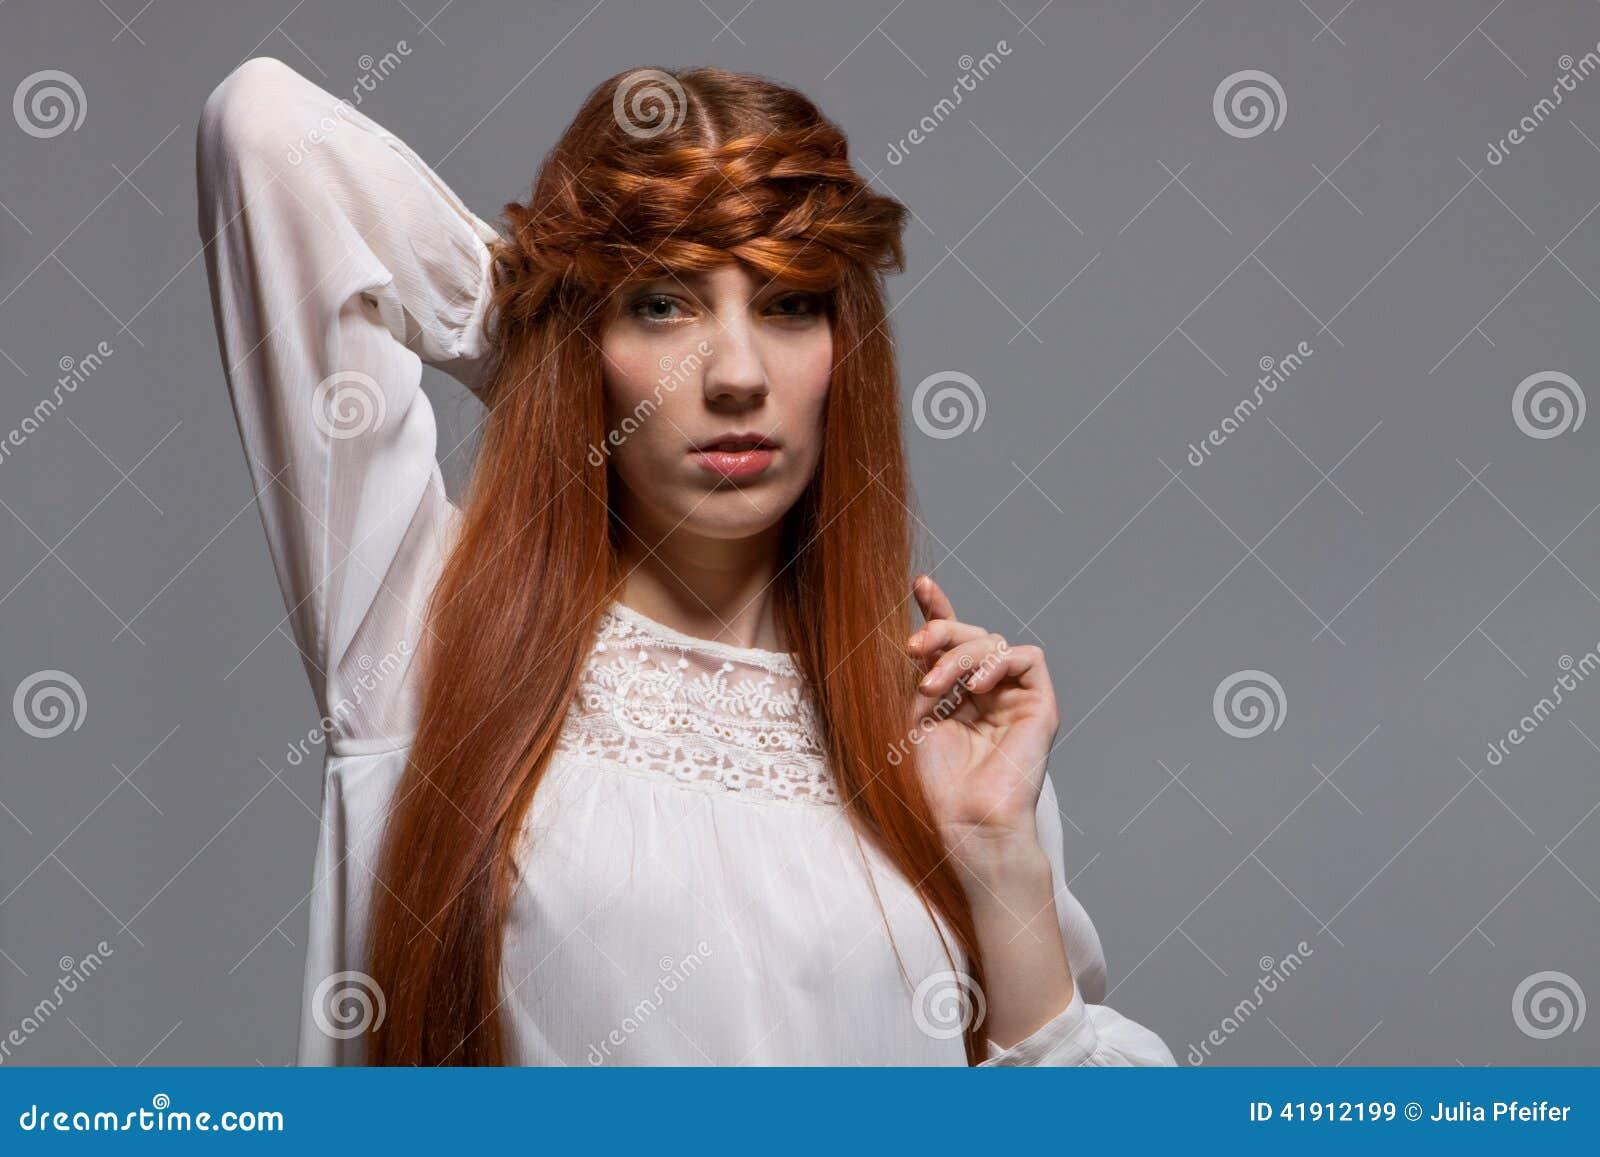 Modelo femenino con la mano en la cintura